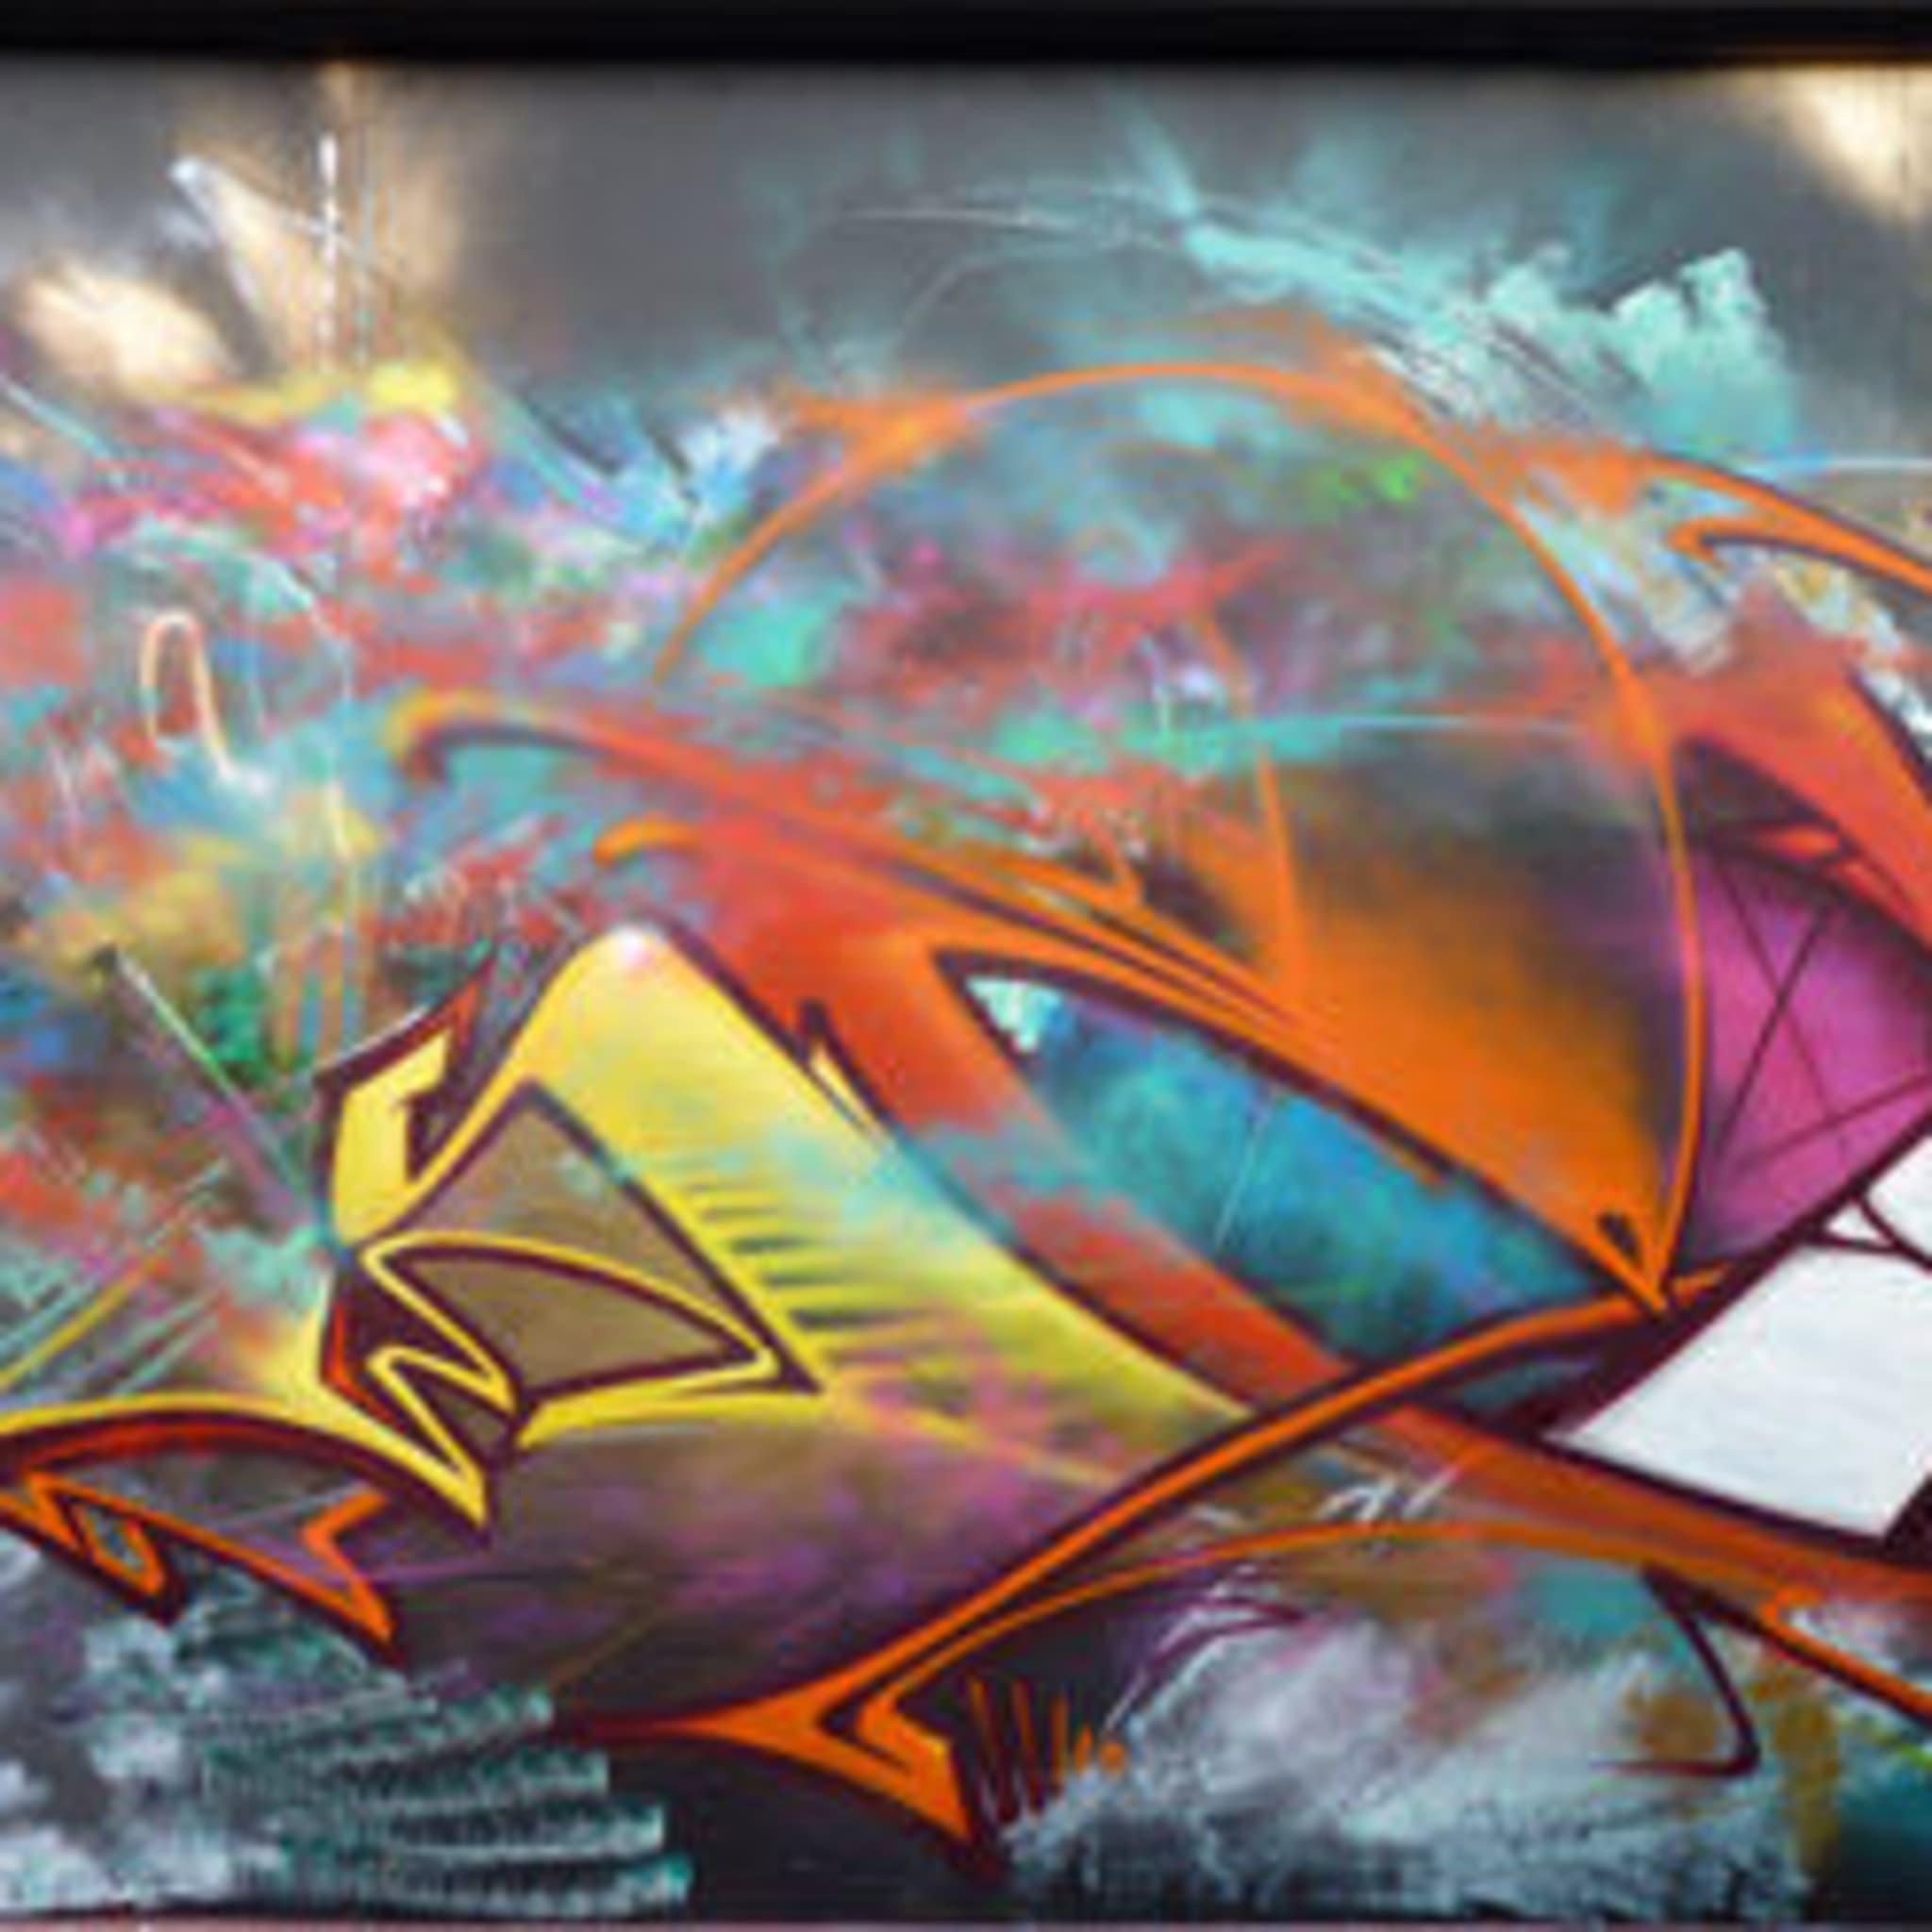 Artwork By Mr Jago in Bristol